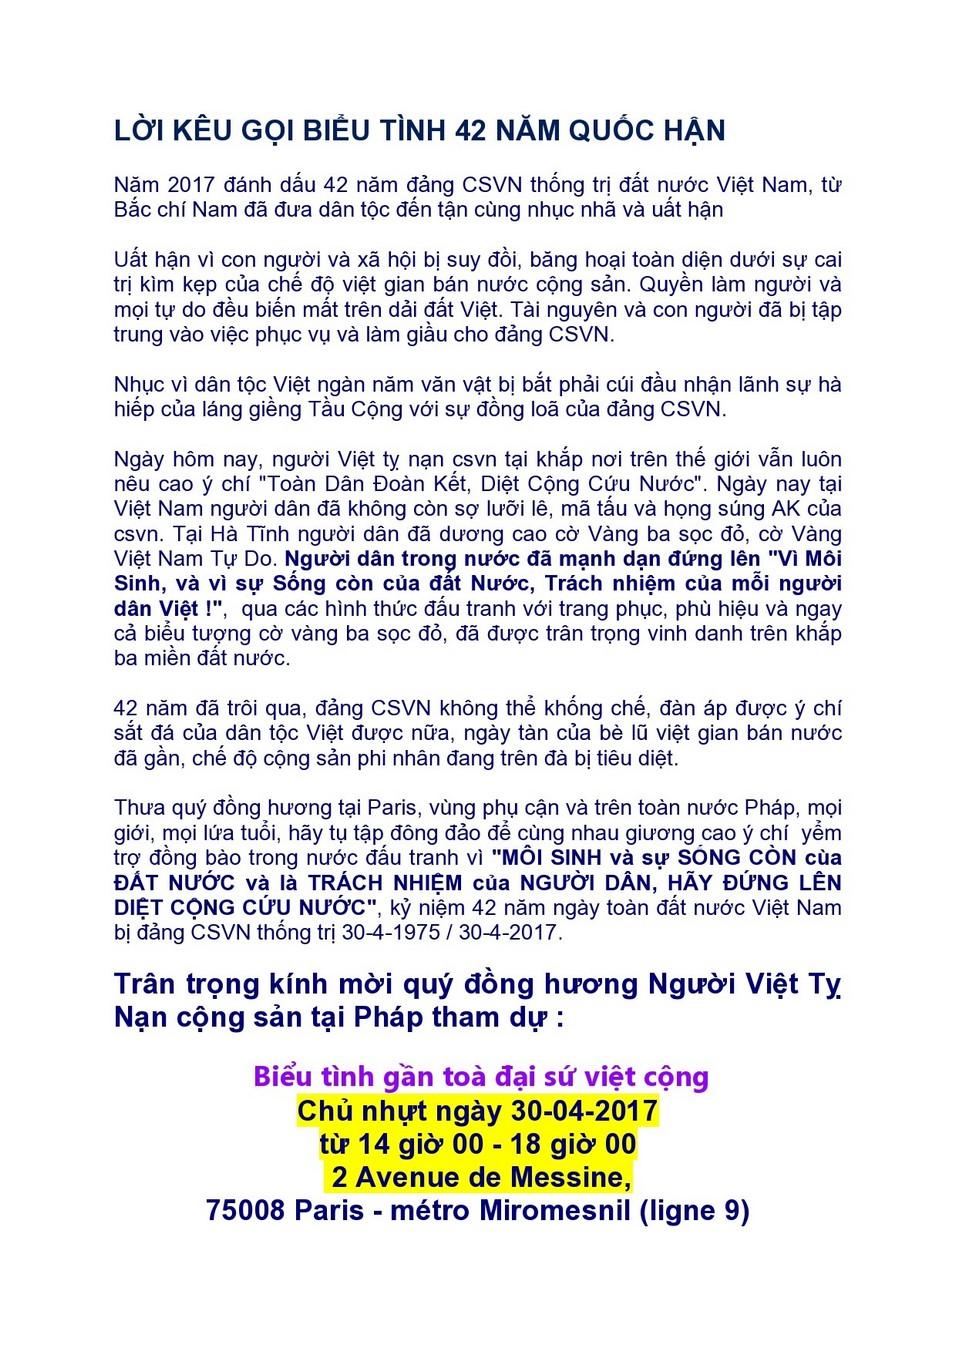 LOI KEU GOI QH2017-page0001.jpg